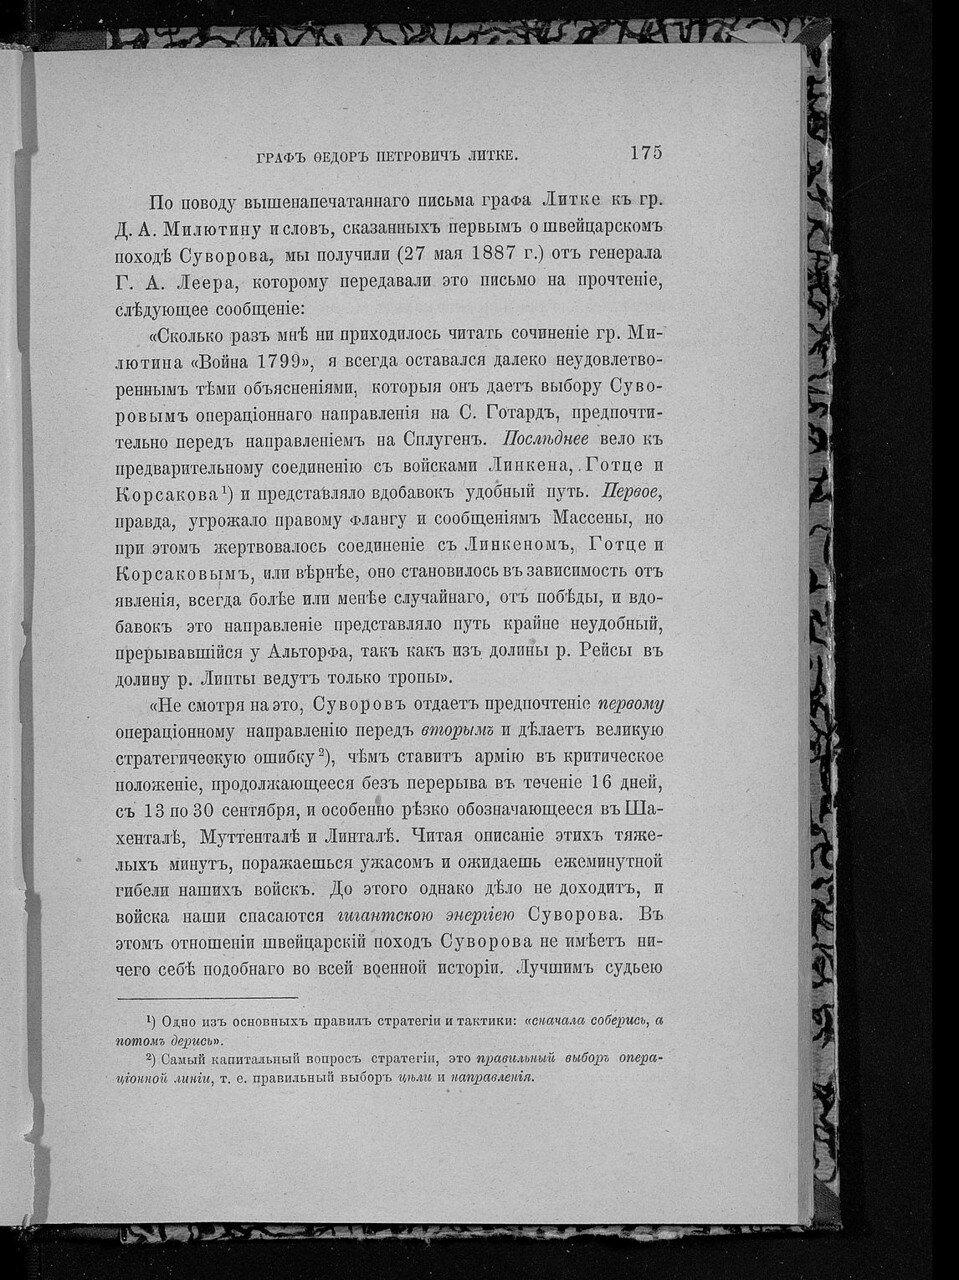 https://img-fotki.yandex.ru/get/879536/199368979.d6/0_21de4d_da916697_XXXL.jpg